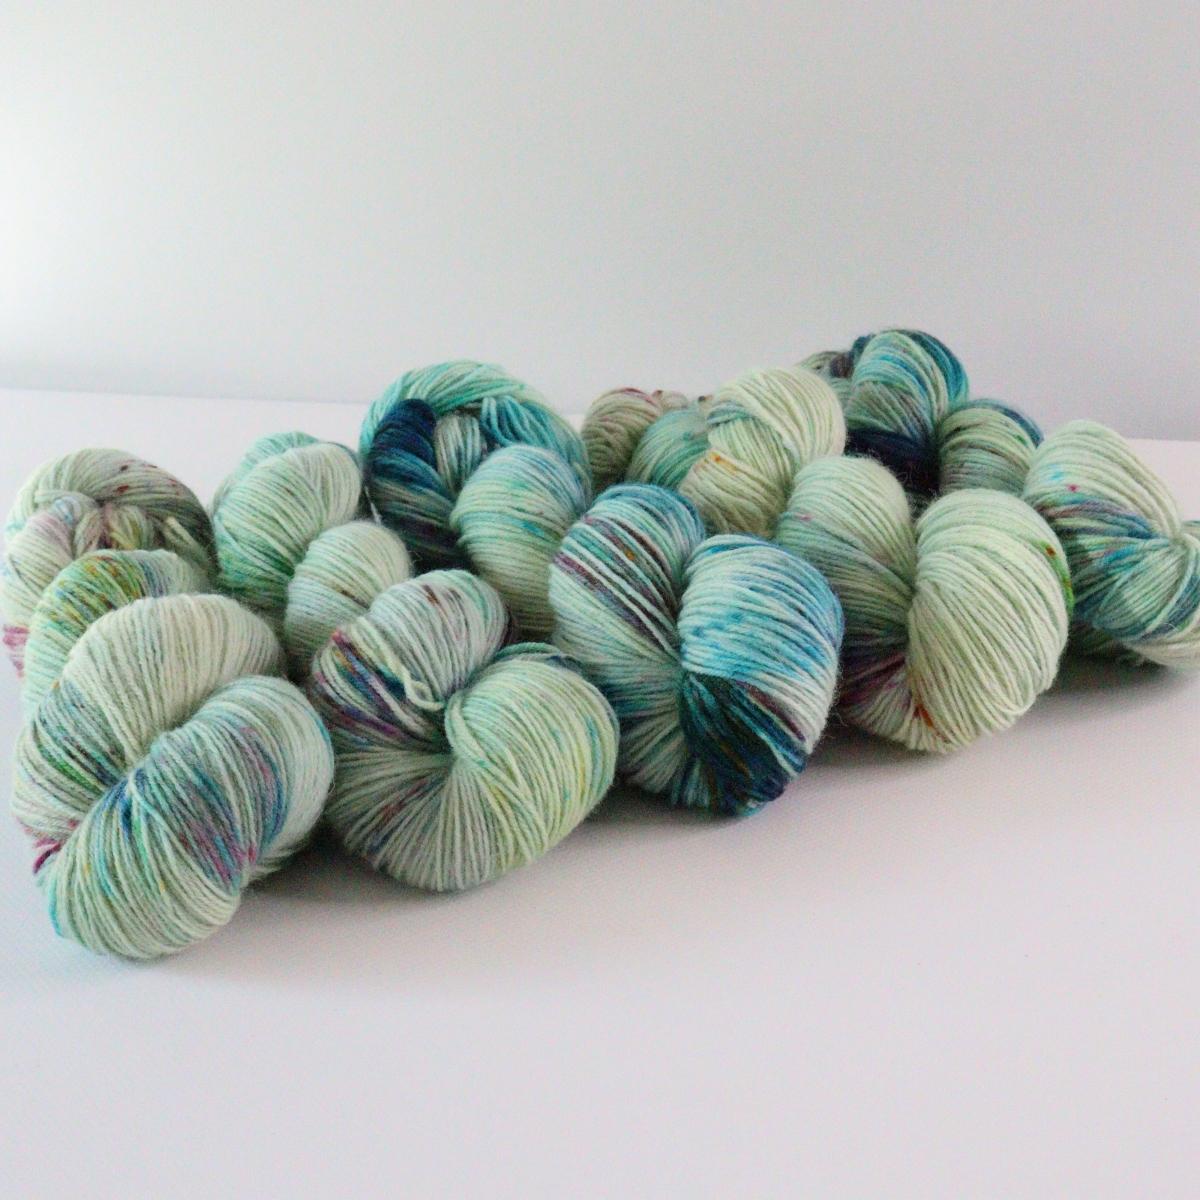 woodico.pro hand dyed yarn 072 1 1200x1200 - Hand dyed yarn / 072